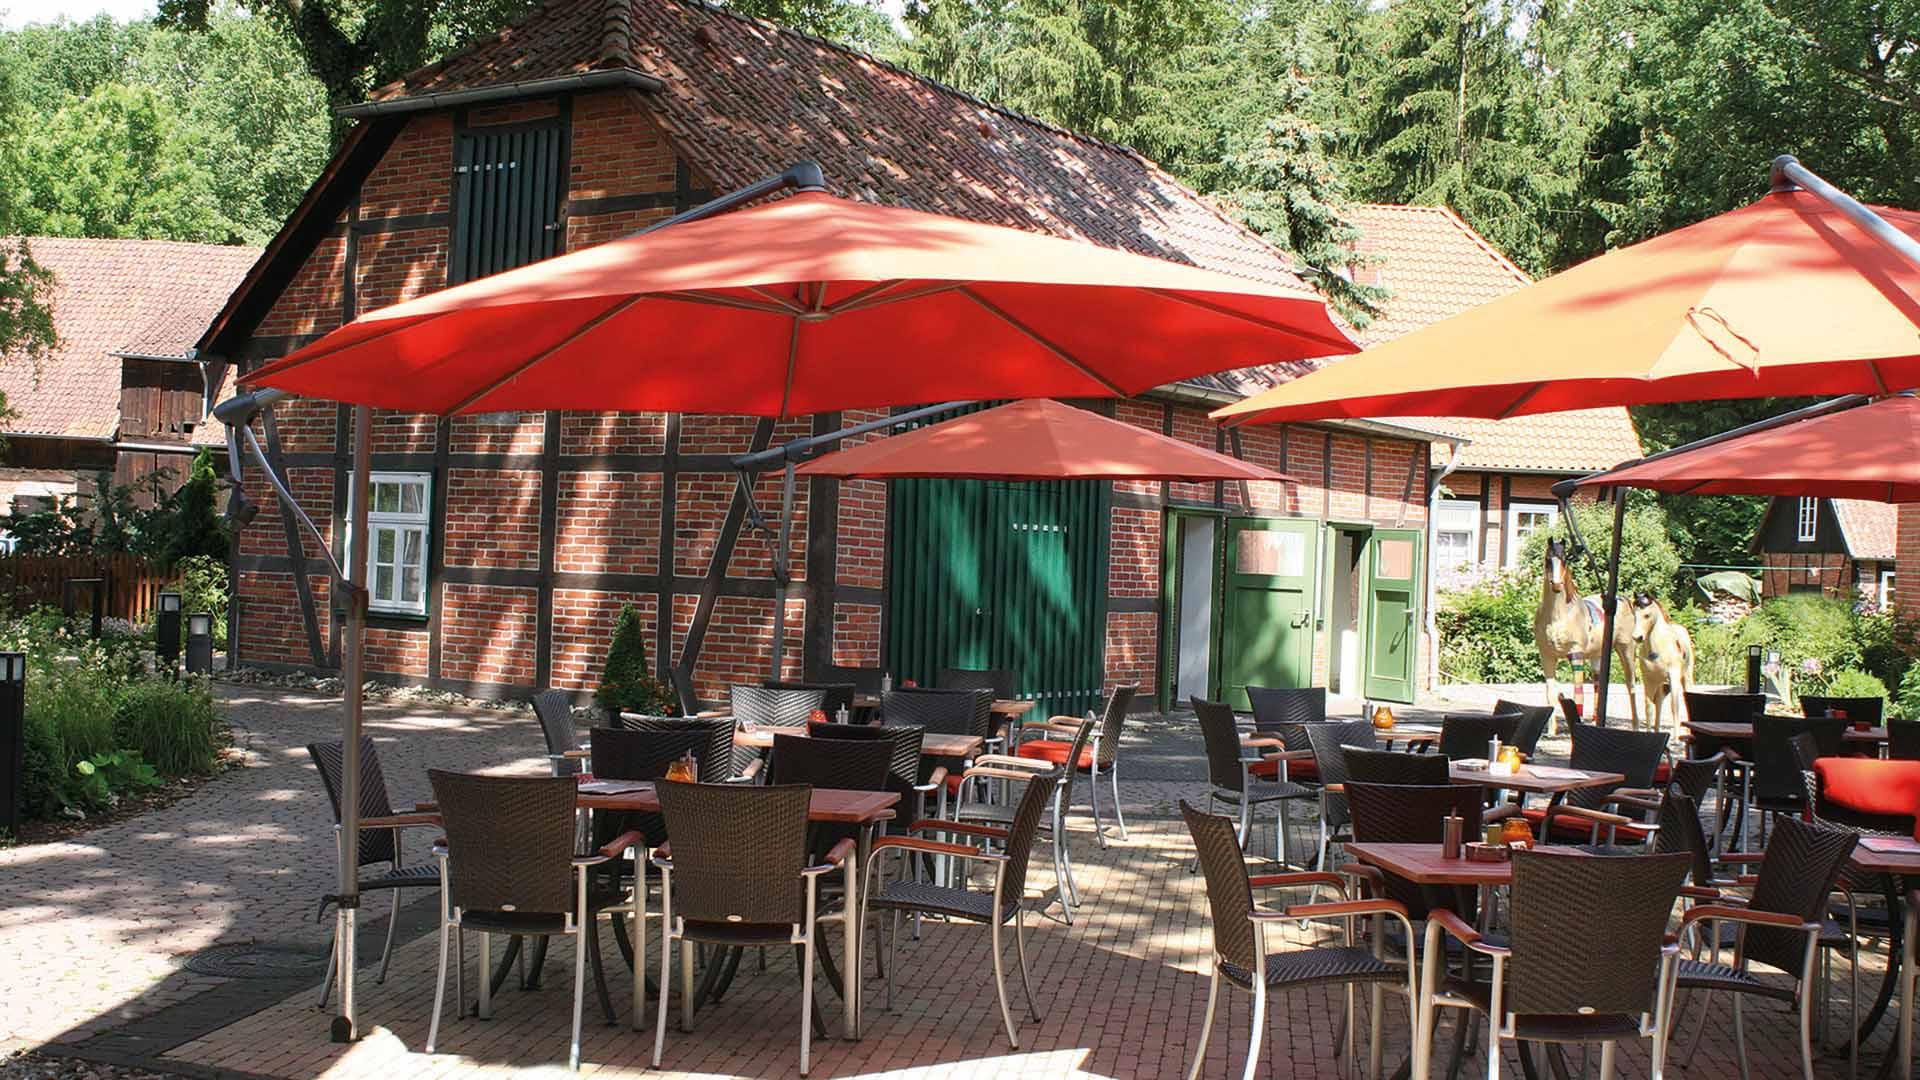 celle-wienhausen-klosterkaffee-4